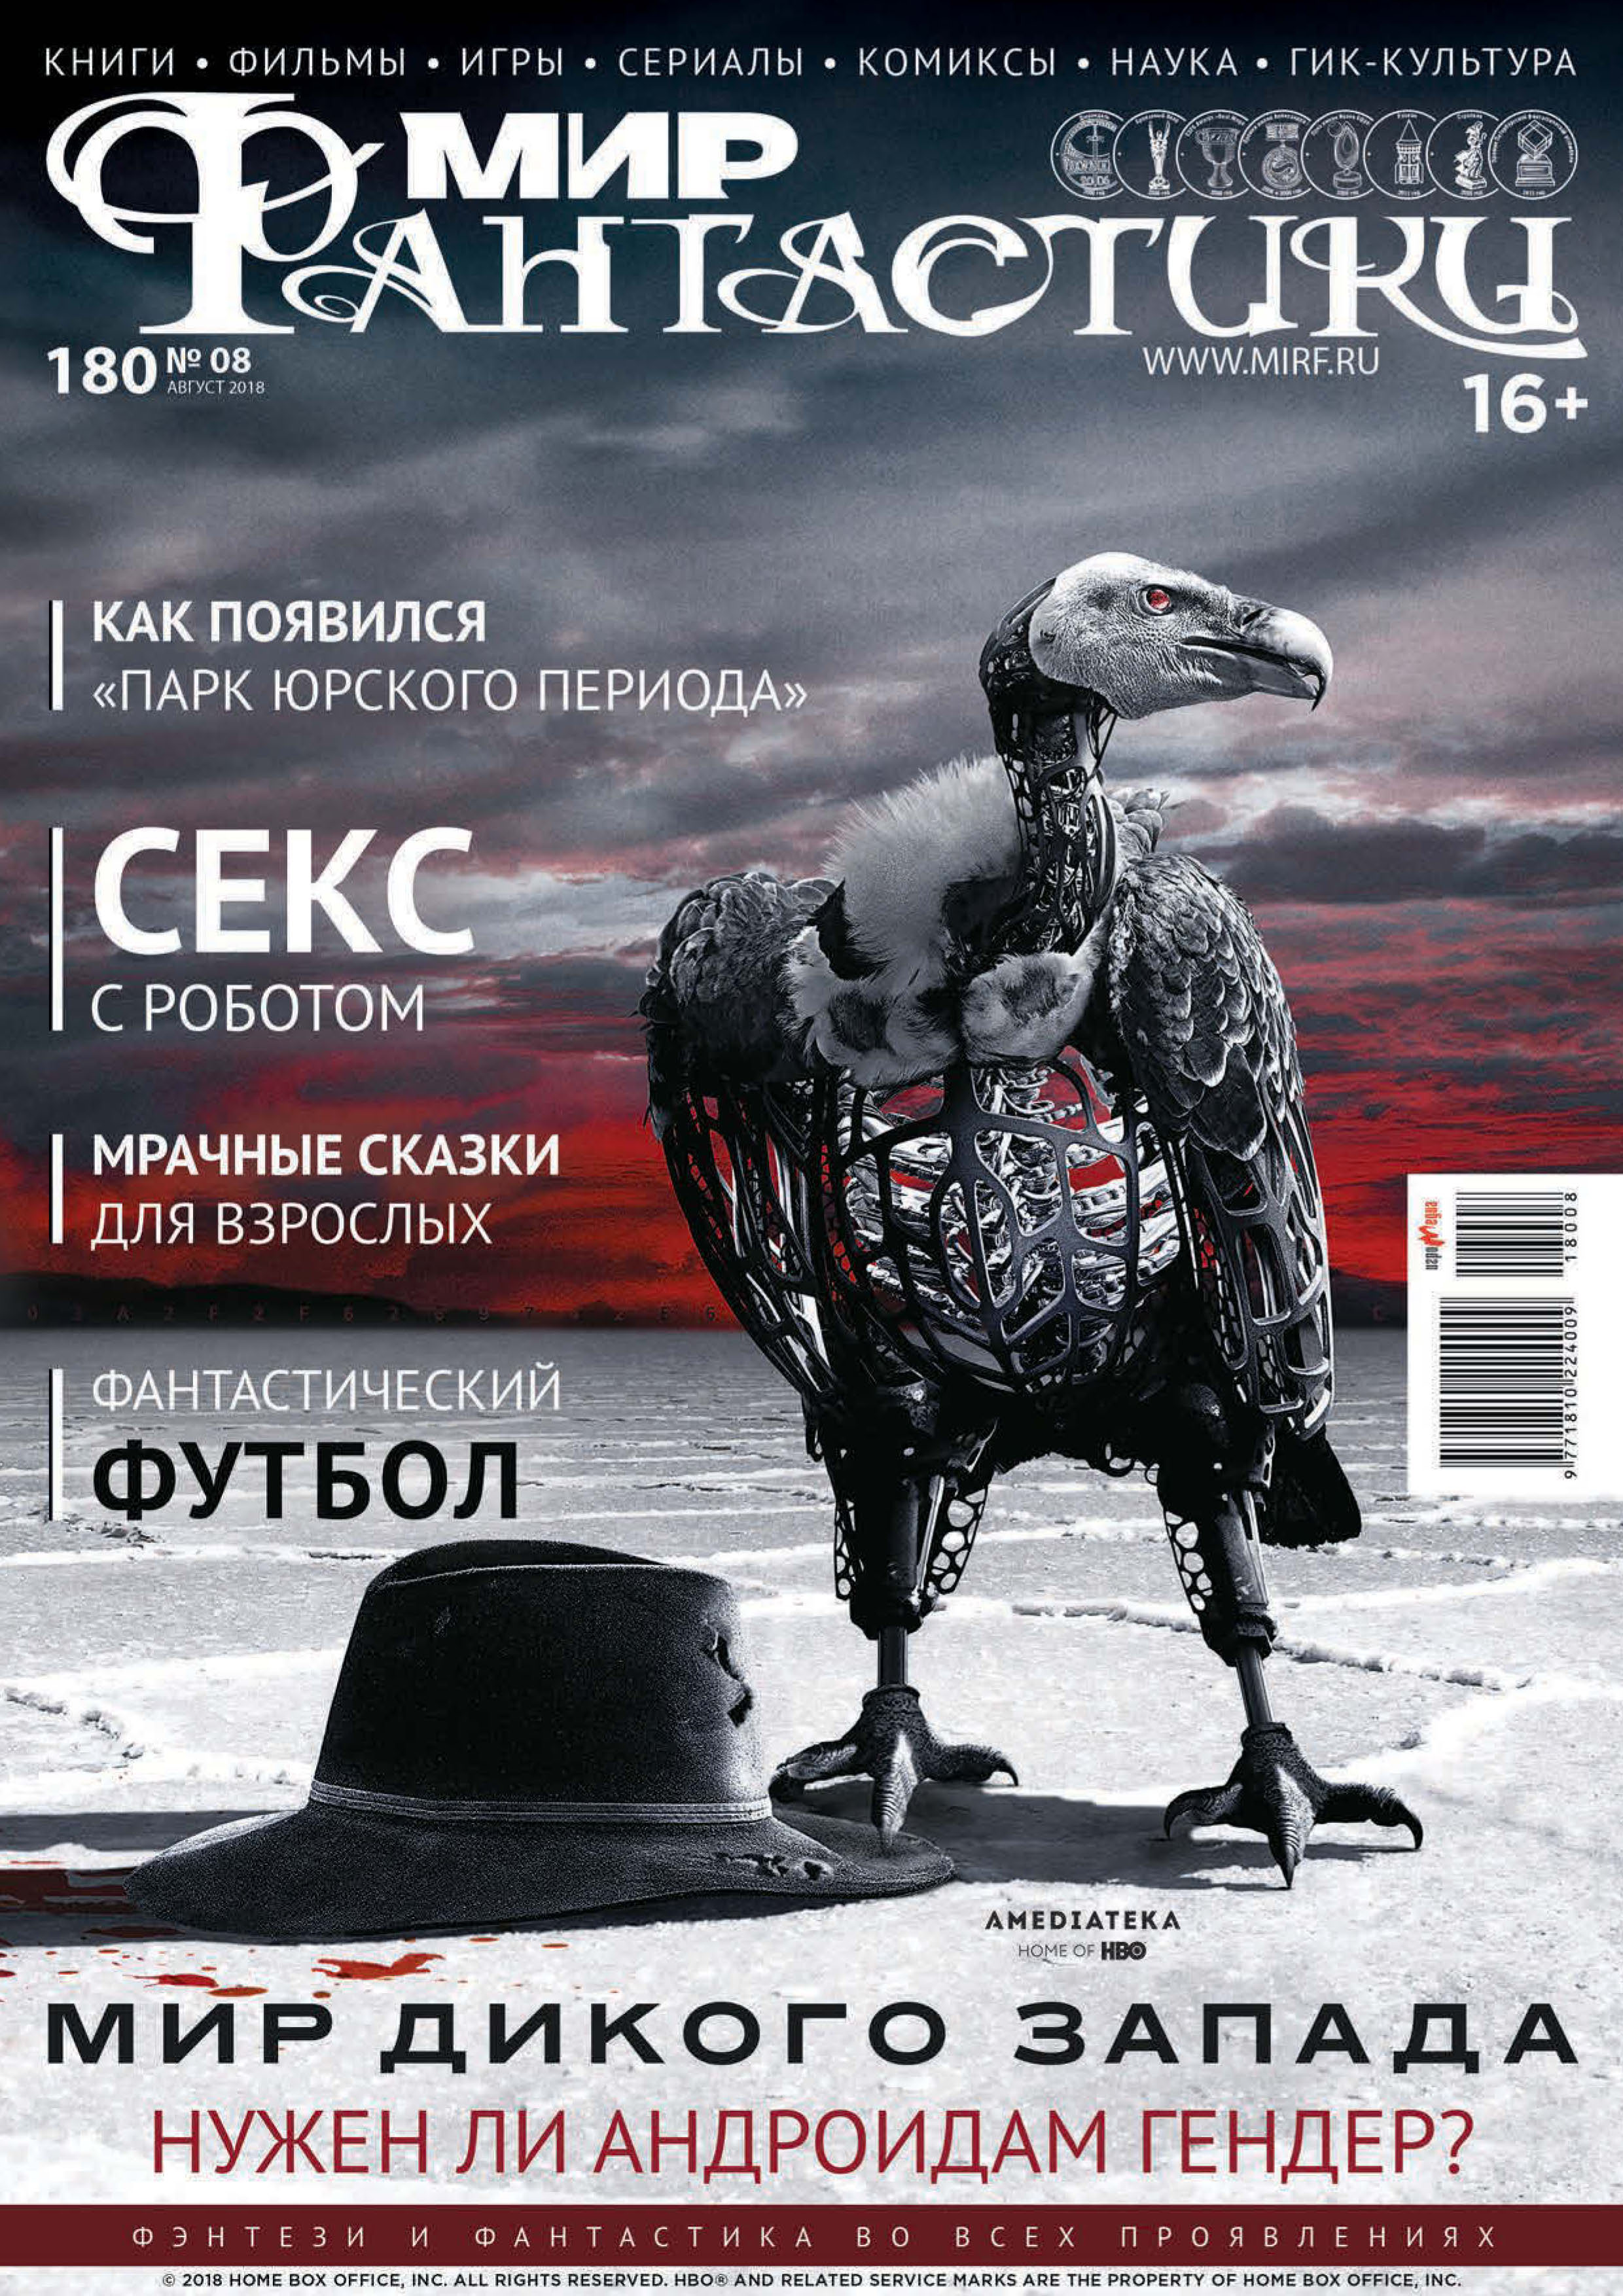 mirf.ru Мир фантастики №08/2018